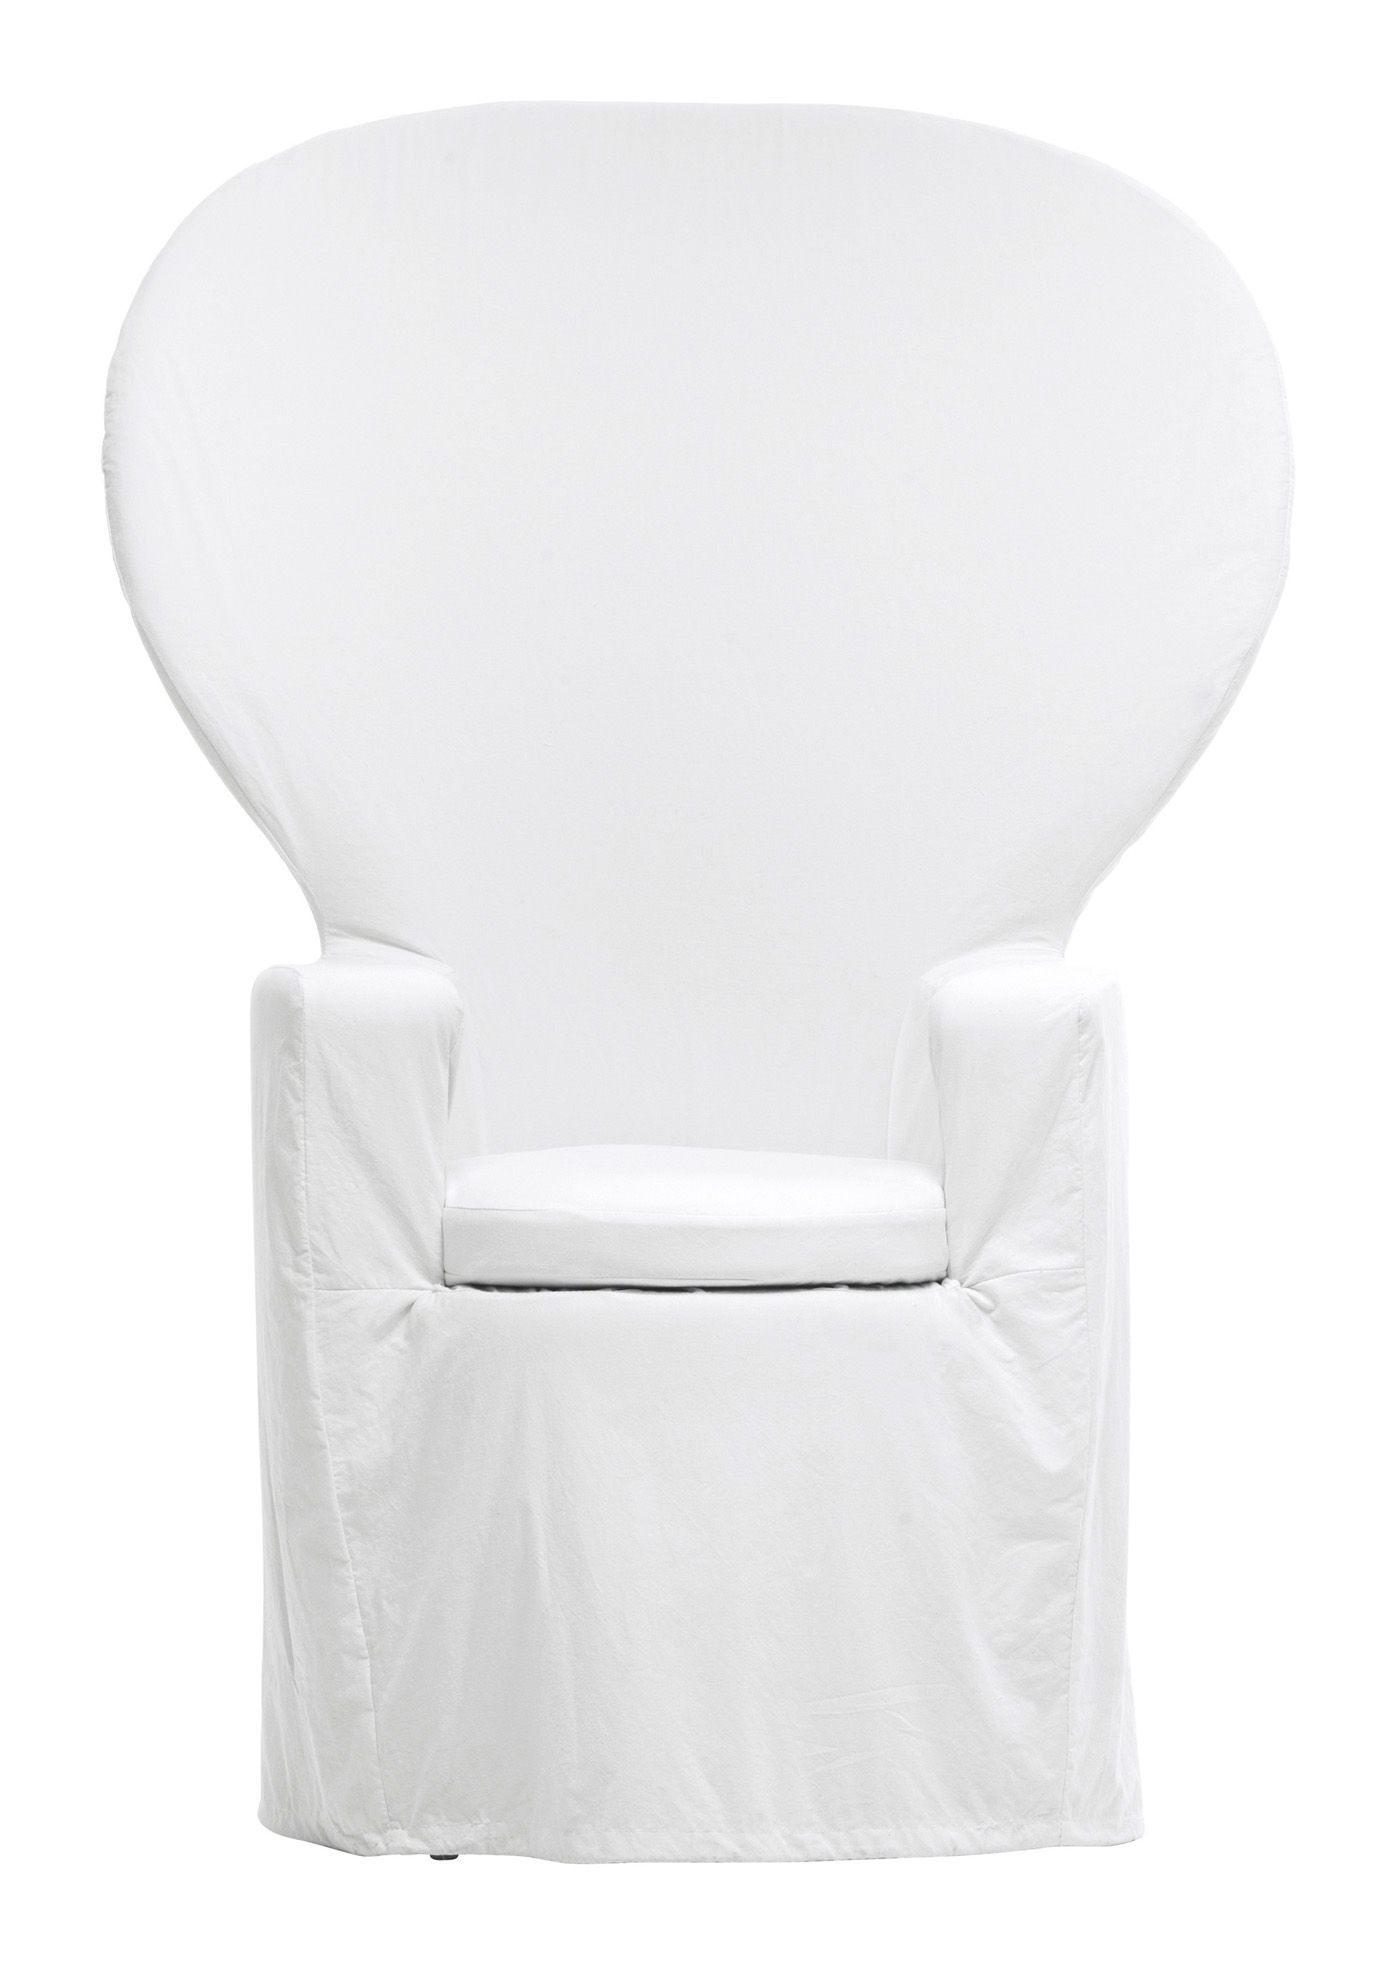 fauteuil emmanuelle by maison martin margiela blanc cerruti baleri. Black Bedroom Furniture Sets. Home Design Ideas